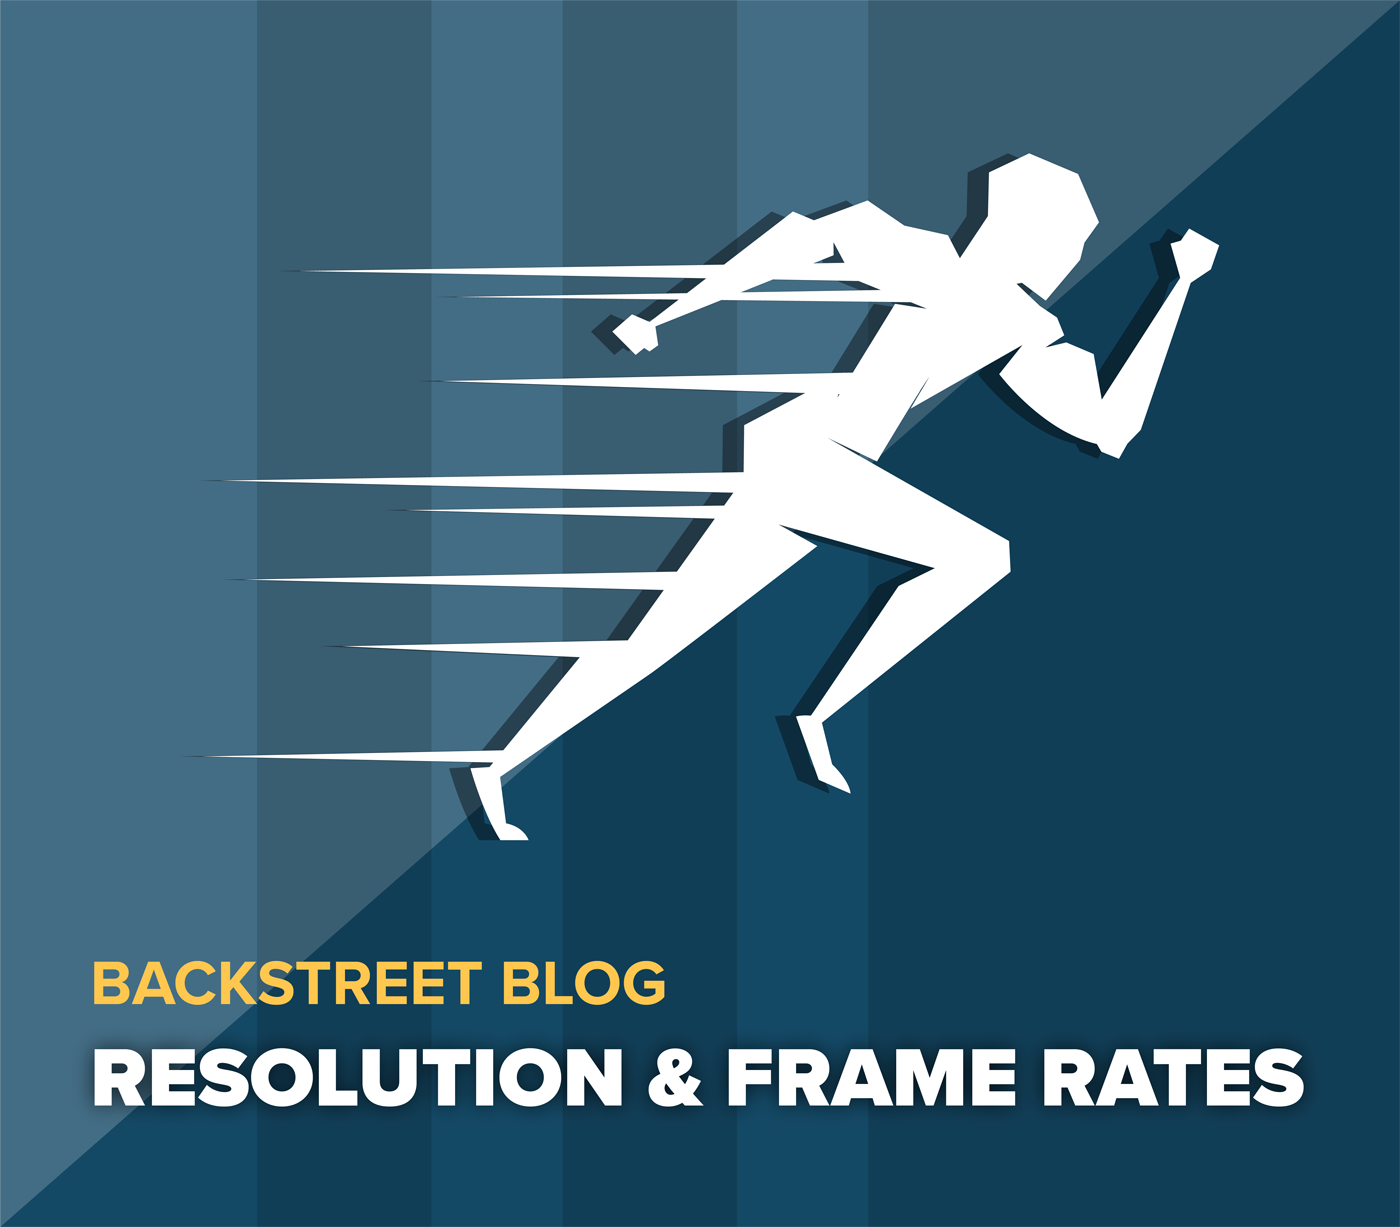 Understanding Resolution & Frame Rates